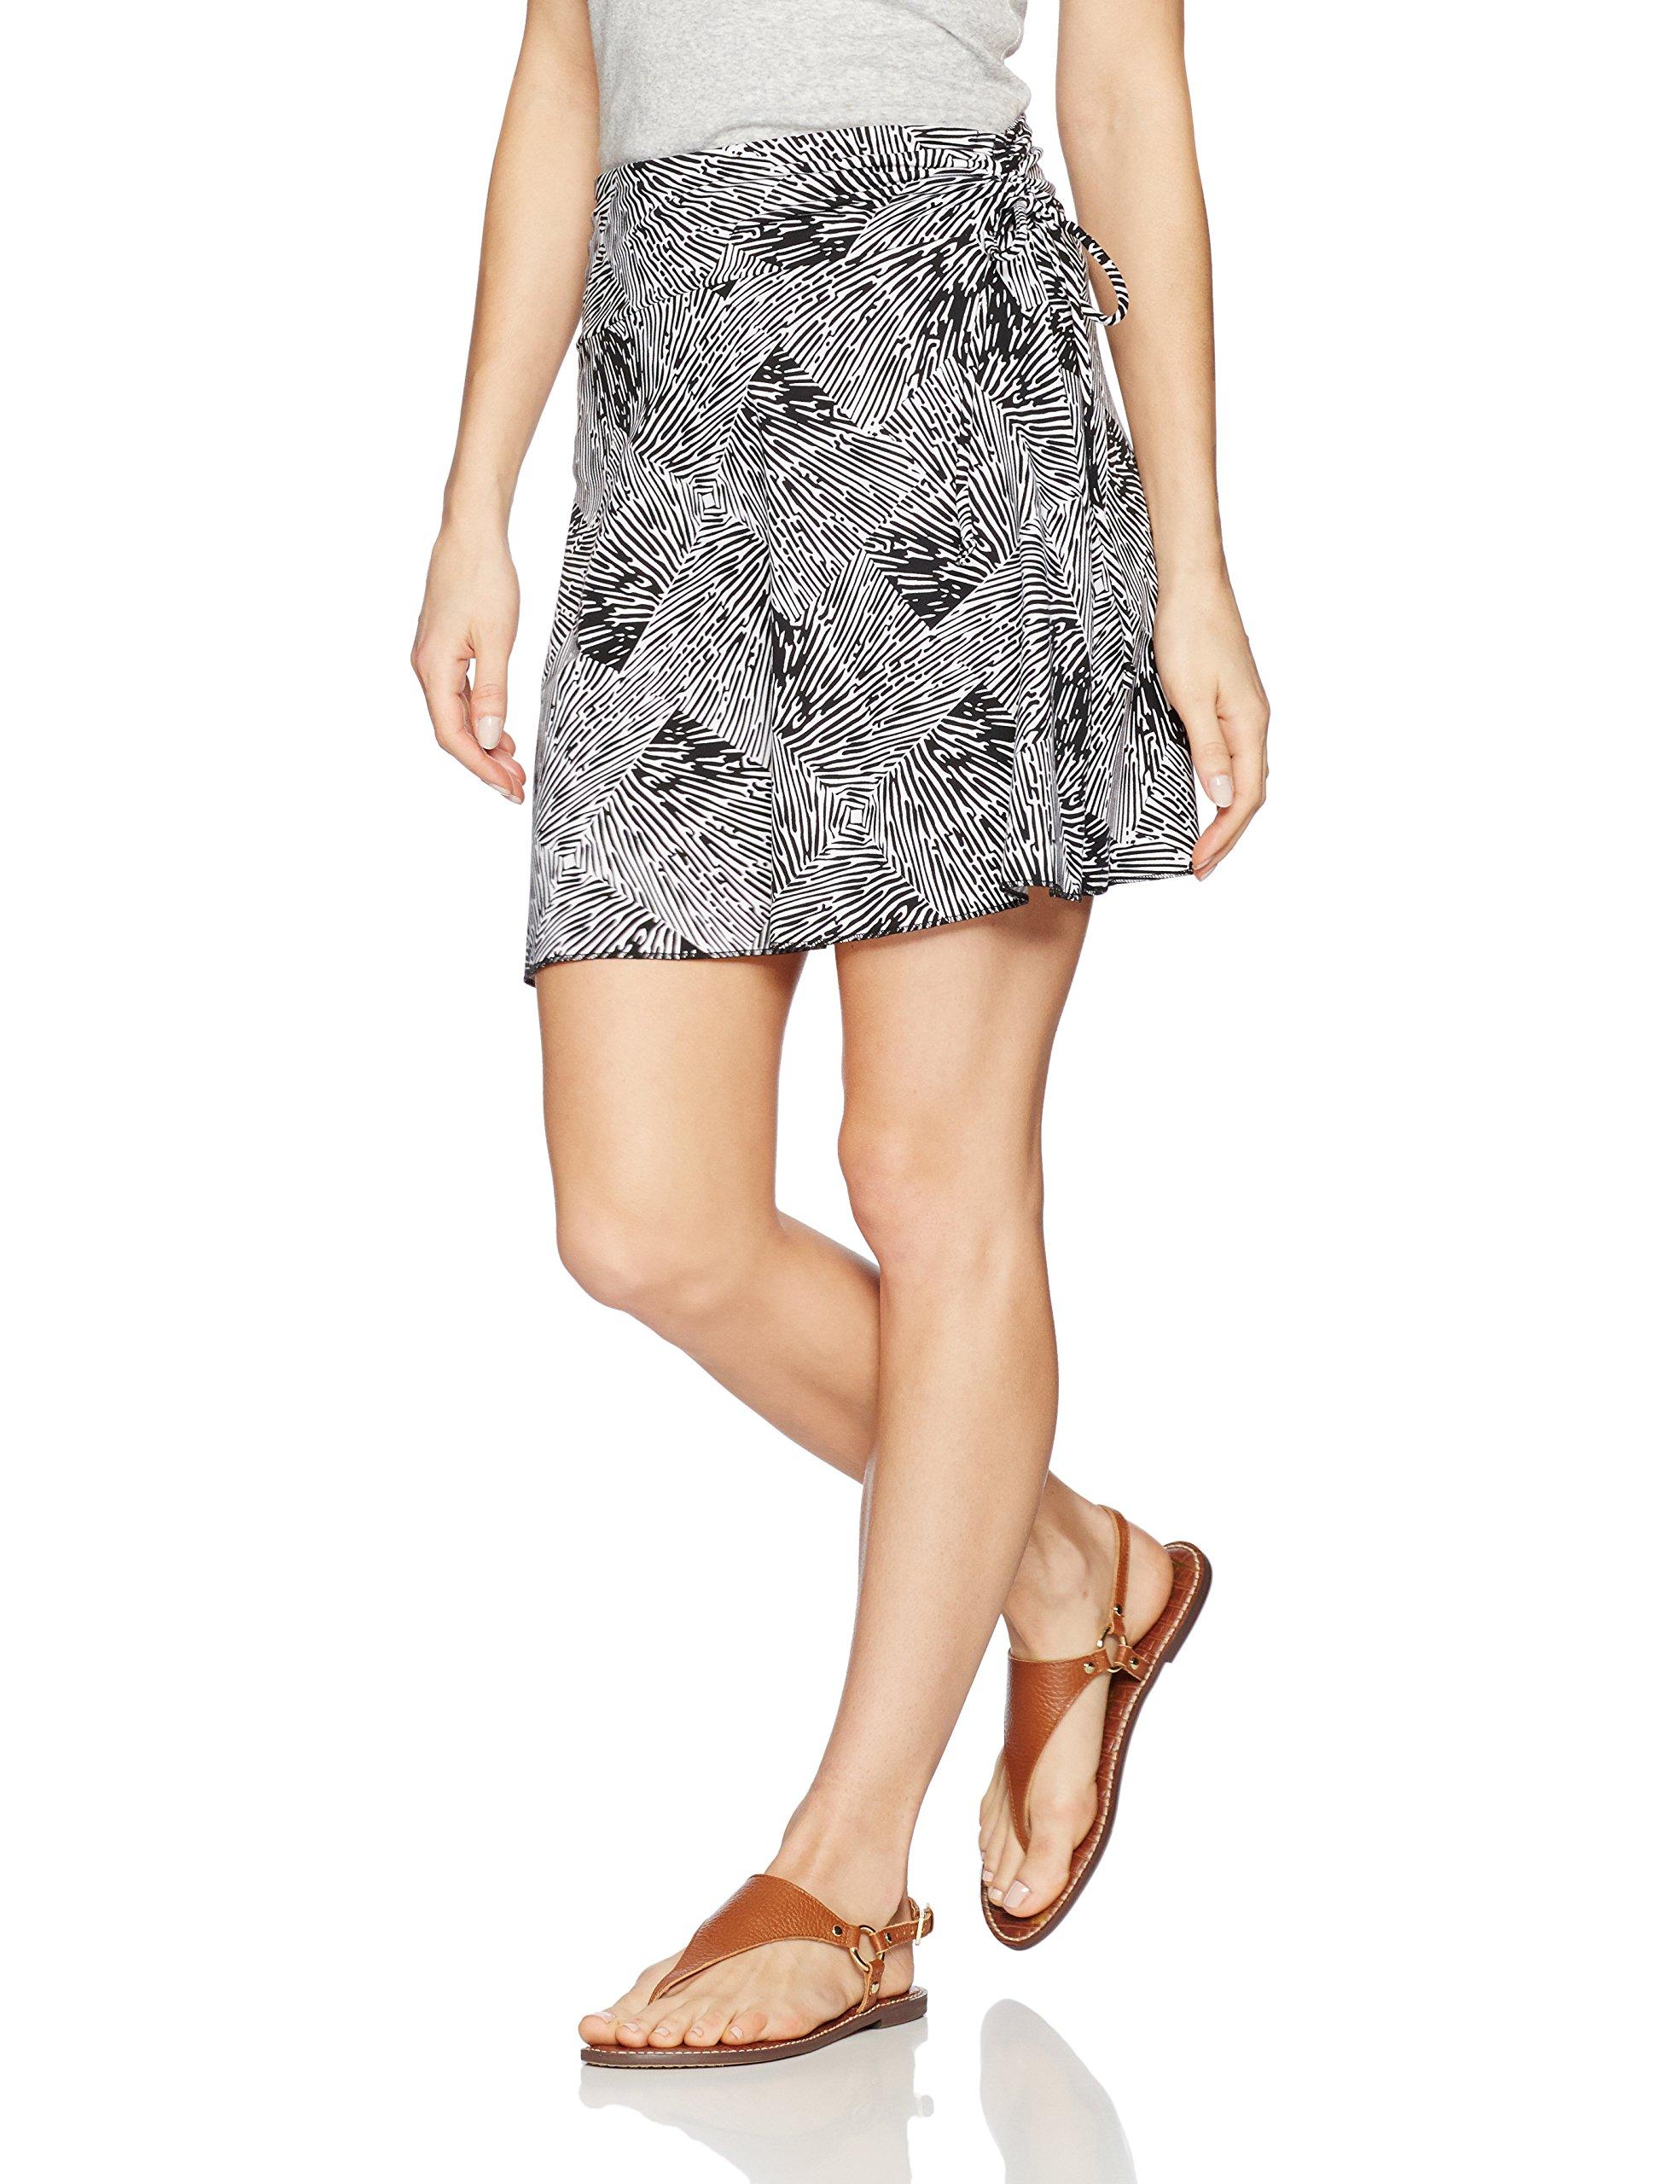 Soybu Women's Serendipity Skirt, Large, Reef